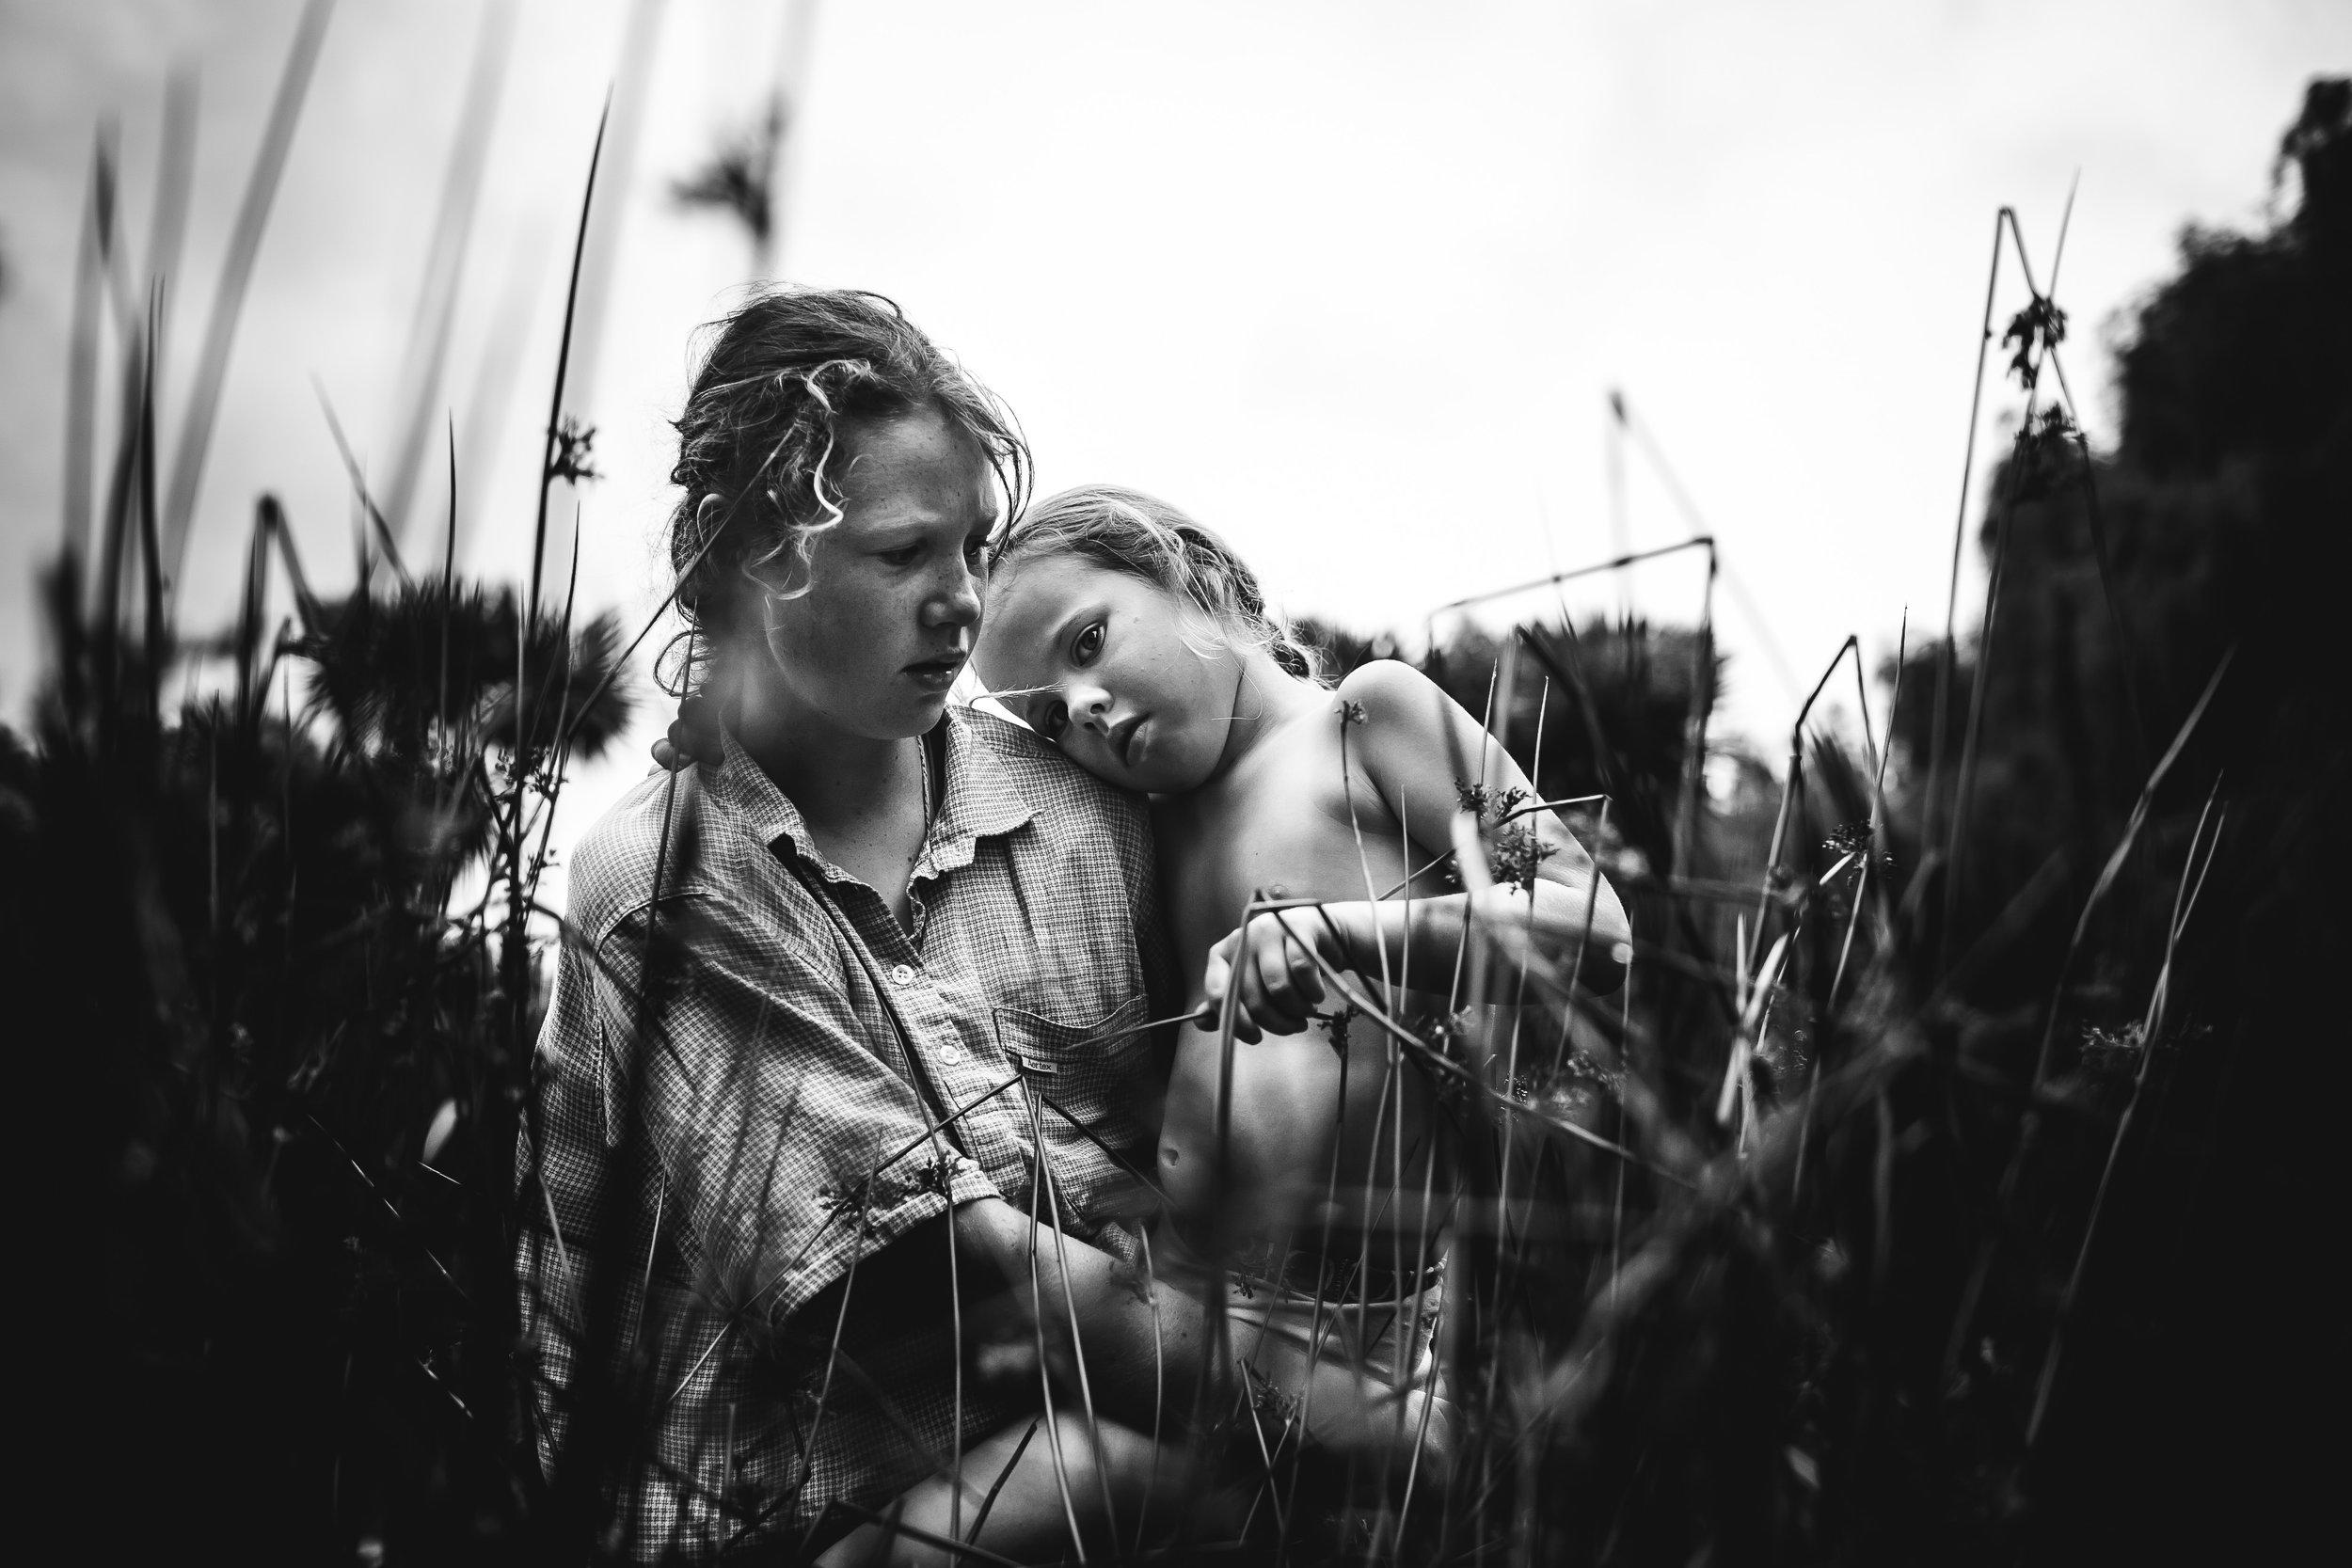 Alter-View_Photography_Showcase_Niki_Boon_12.jpg